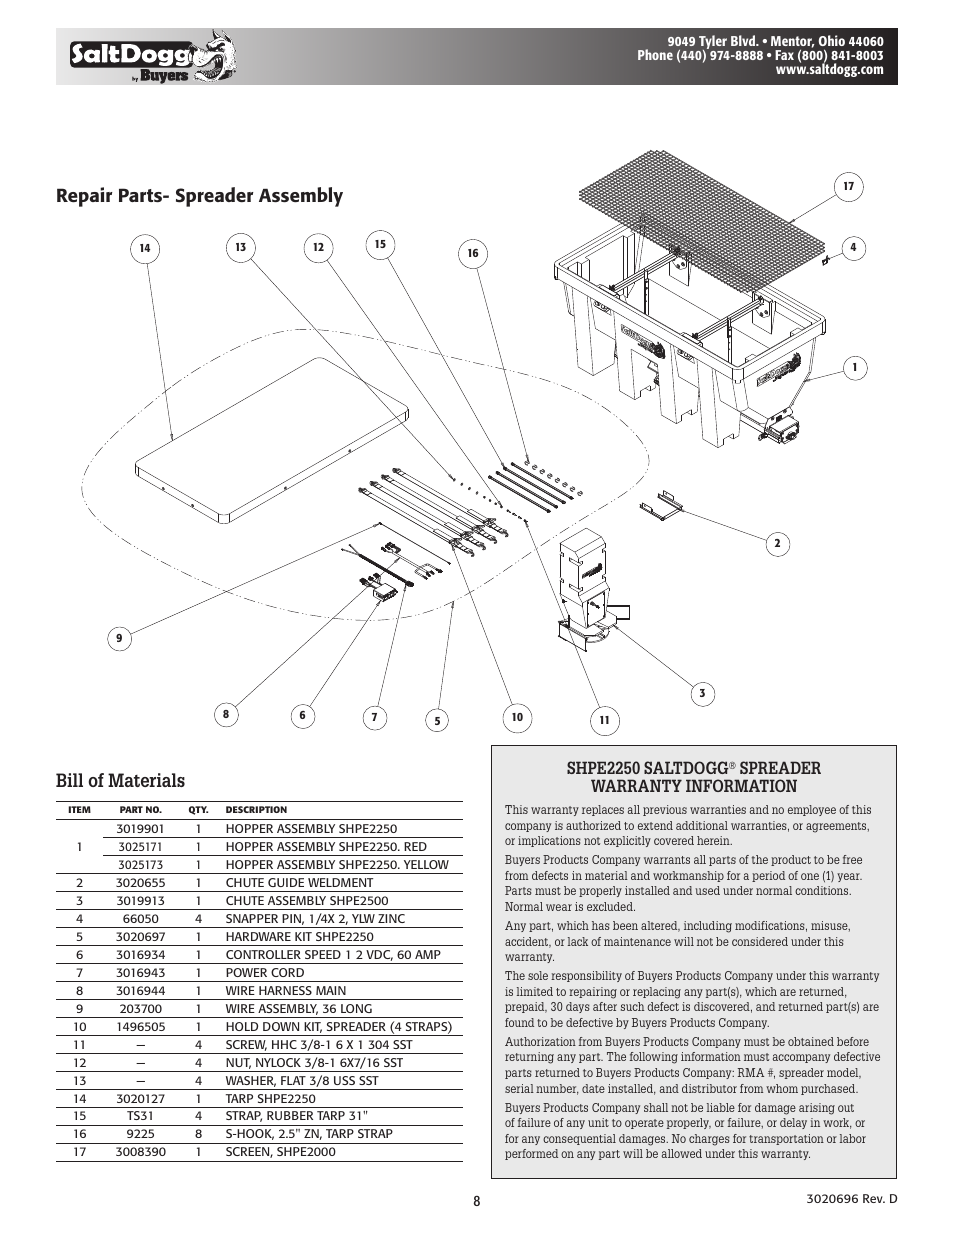 repair parts spreader assembly, bill of materials, shpe2250